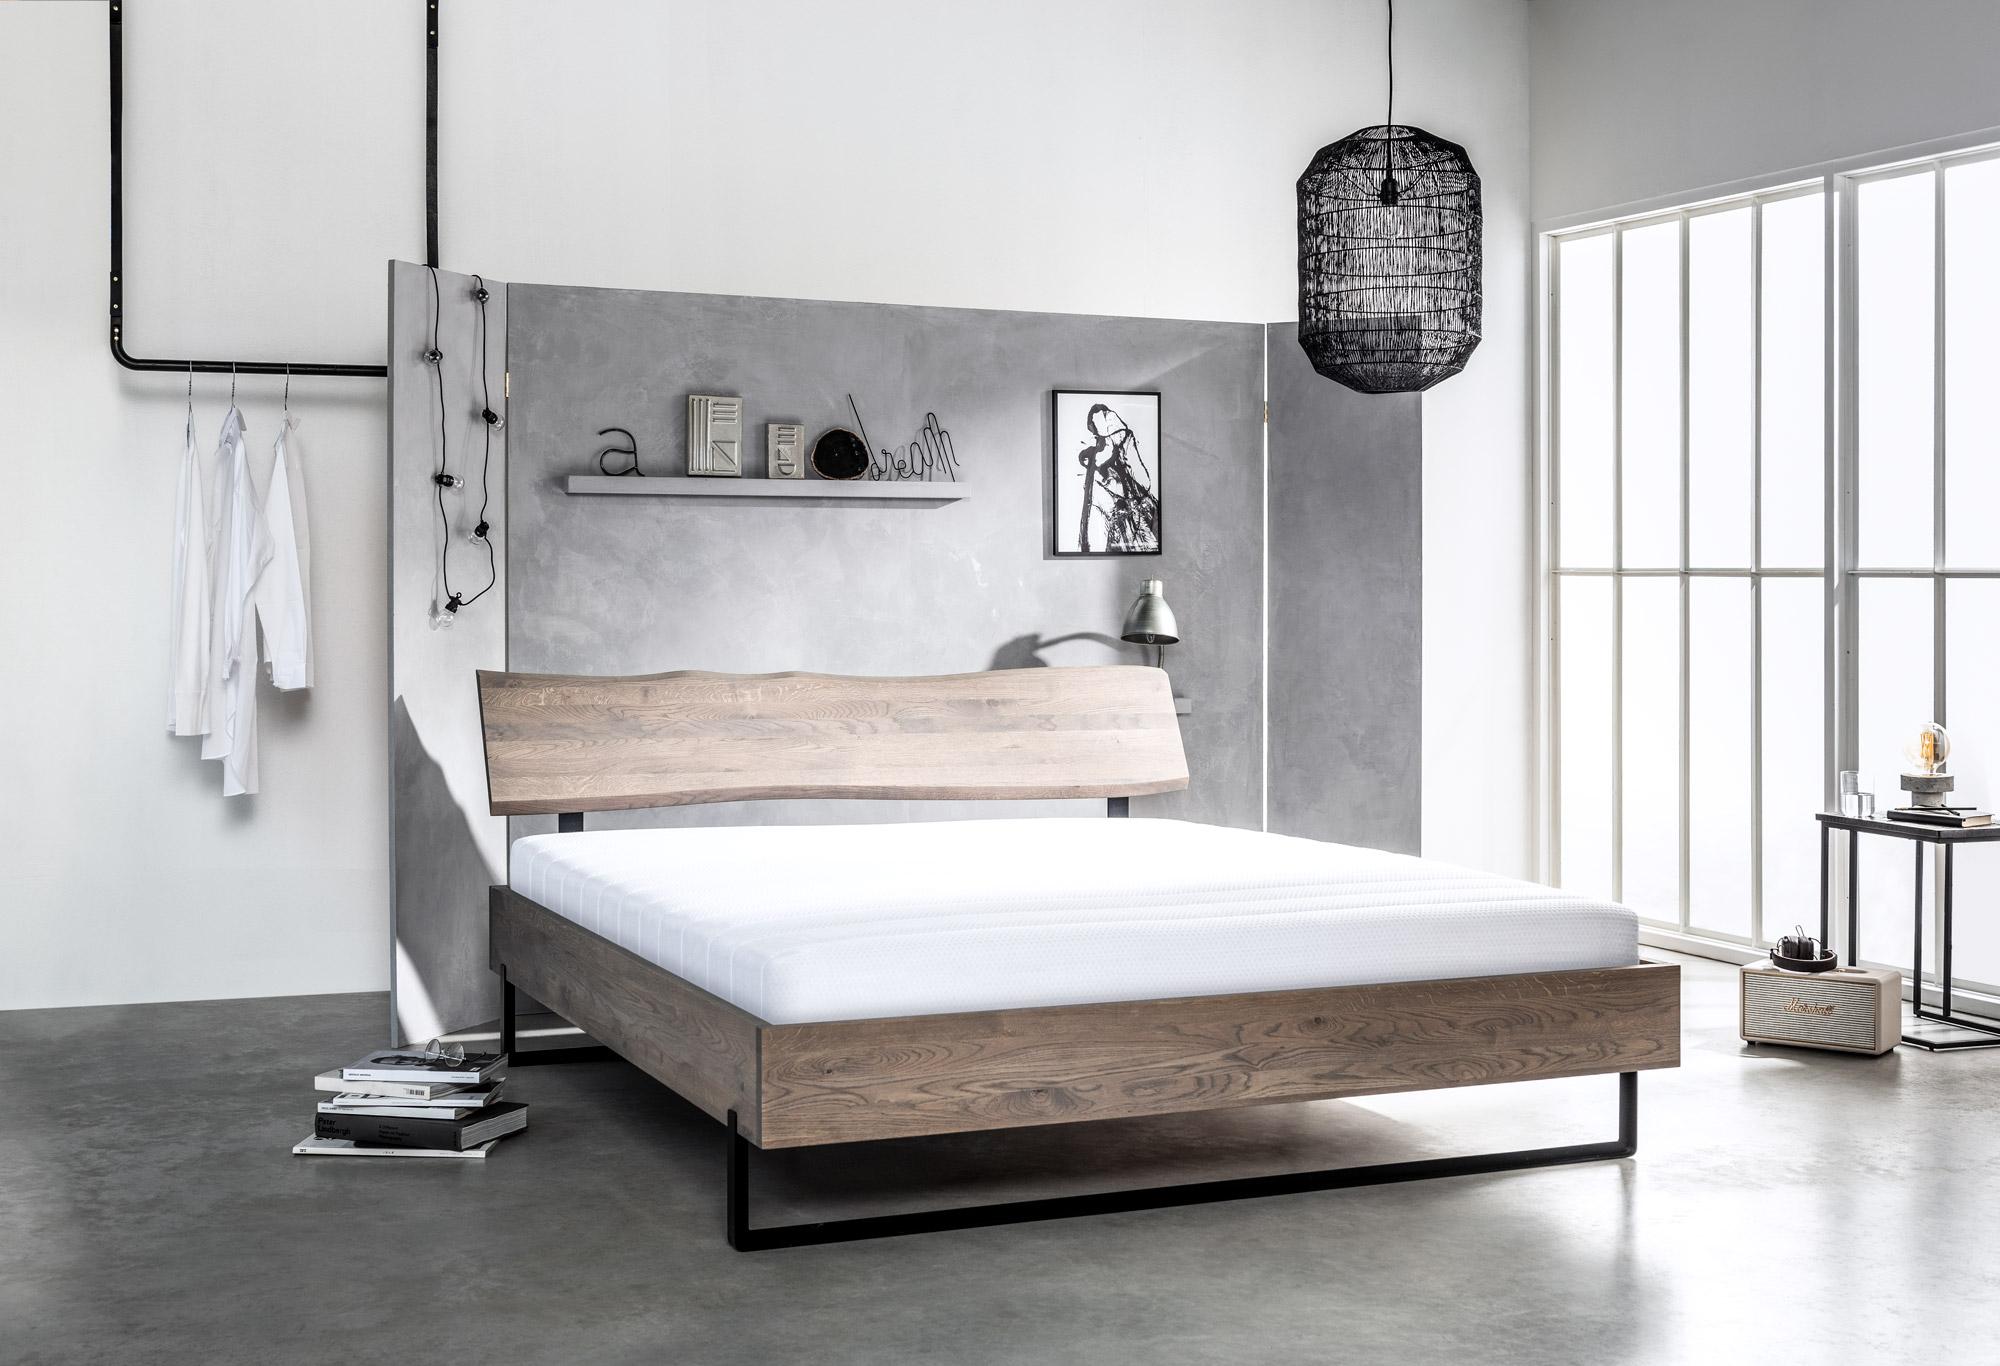 Bedframe balance Raw  | Swiss Sense